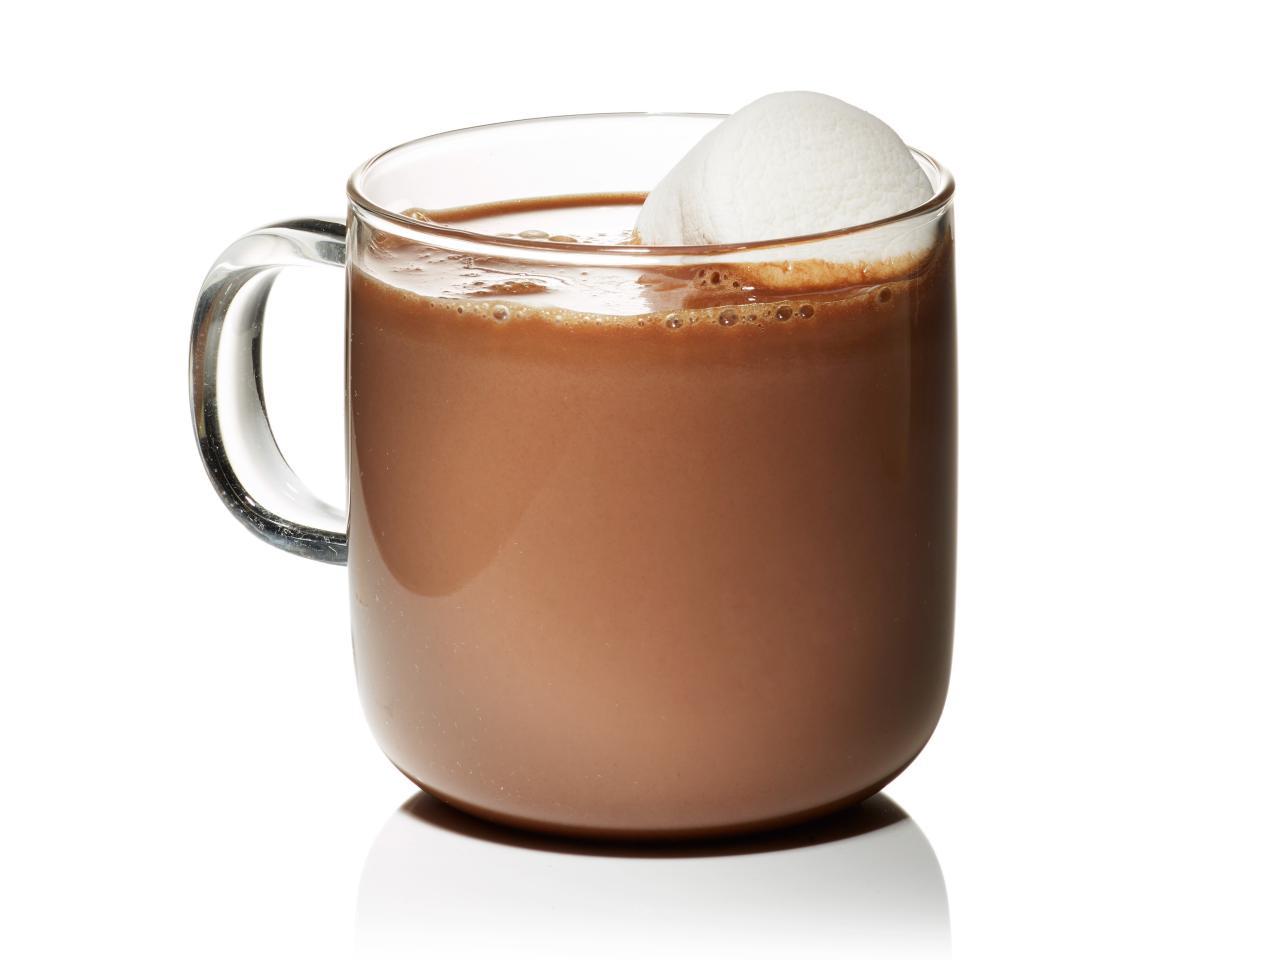 https: img.okeinfo.net content 2017 03 27 481 1652506 jangan-terlalu-sering-minum-cokelat-hangat-ini-alasannya-UGWuMDuu5Y.jpeg